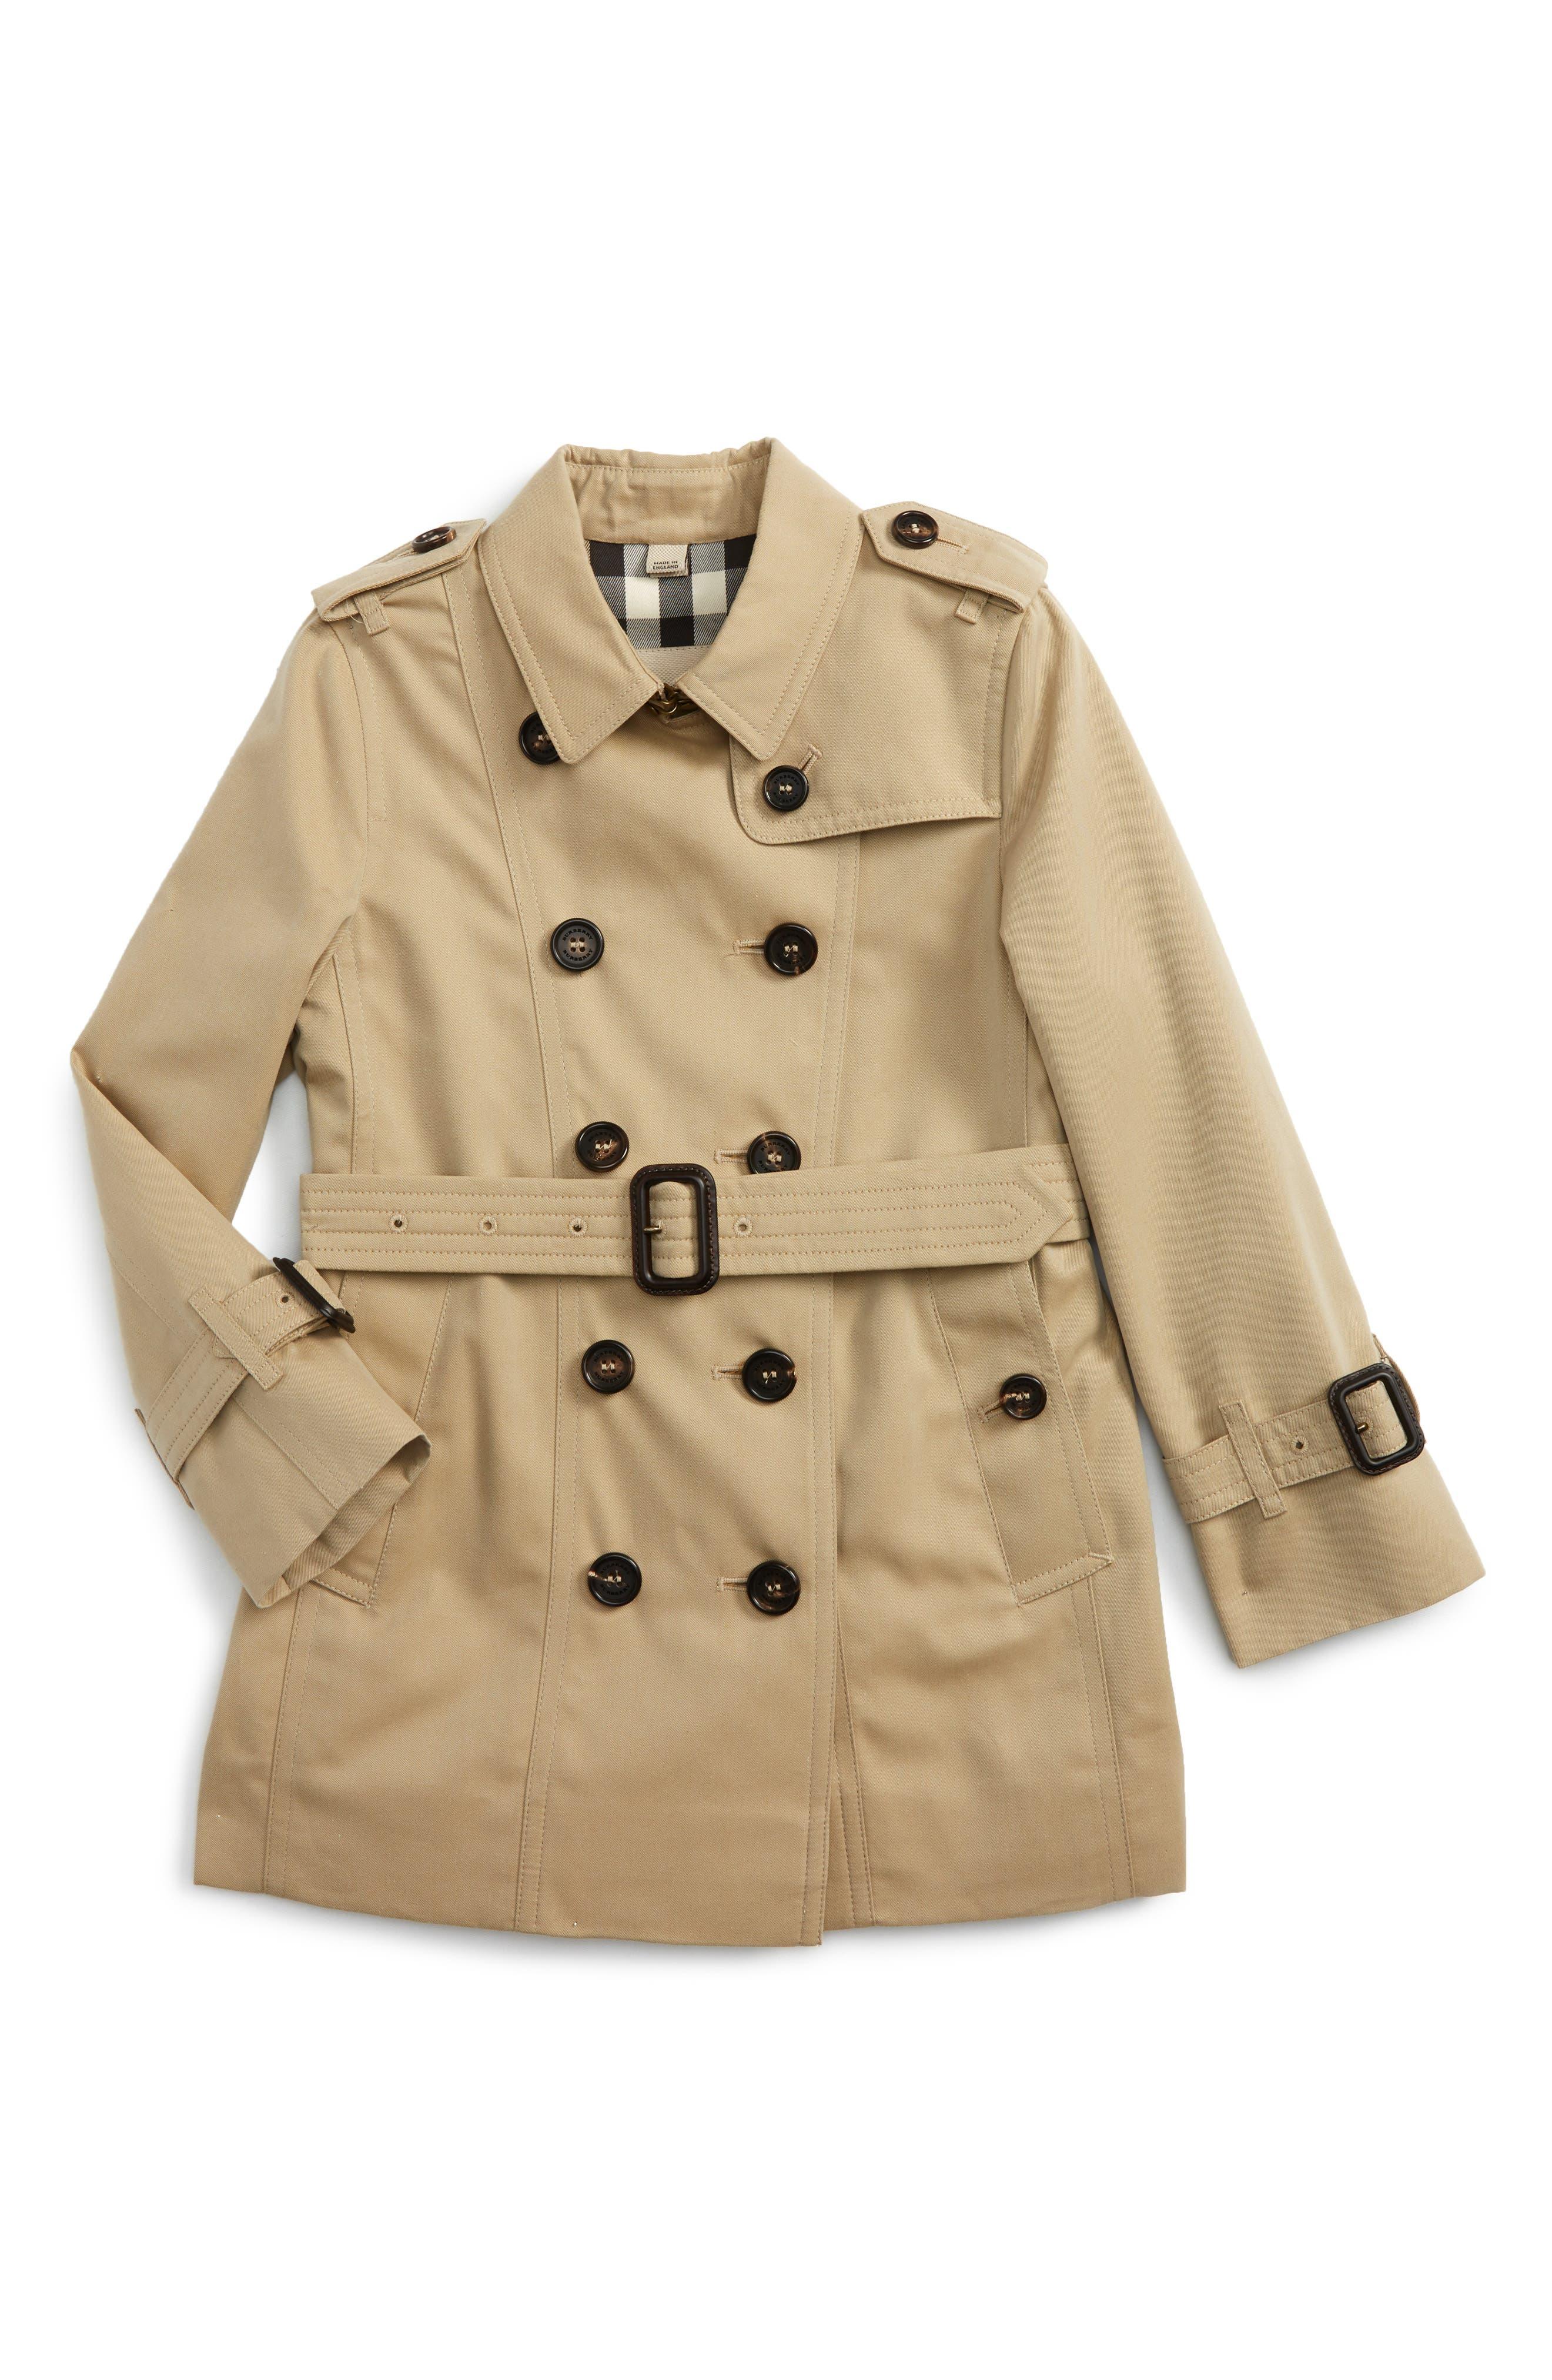 Burberry Sandringham Double Breasted Trench Coat (Little Girls & Big Girls)